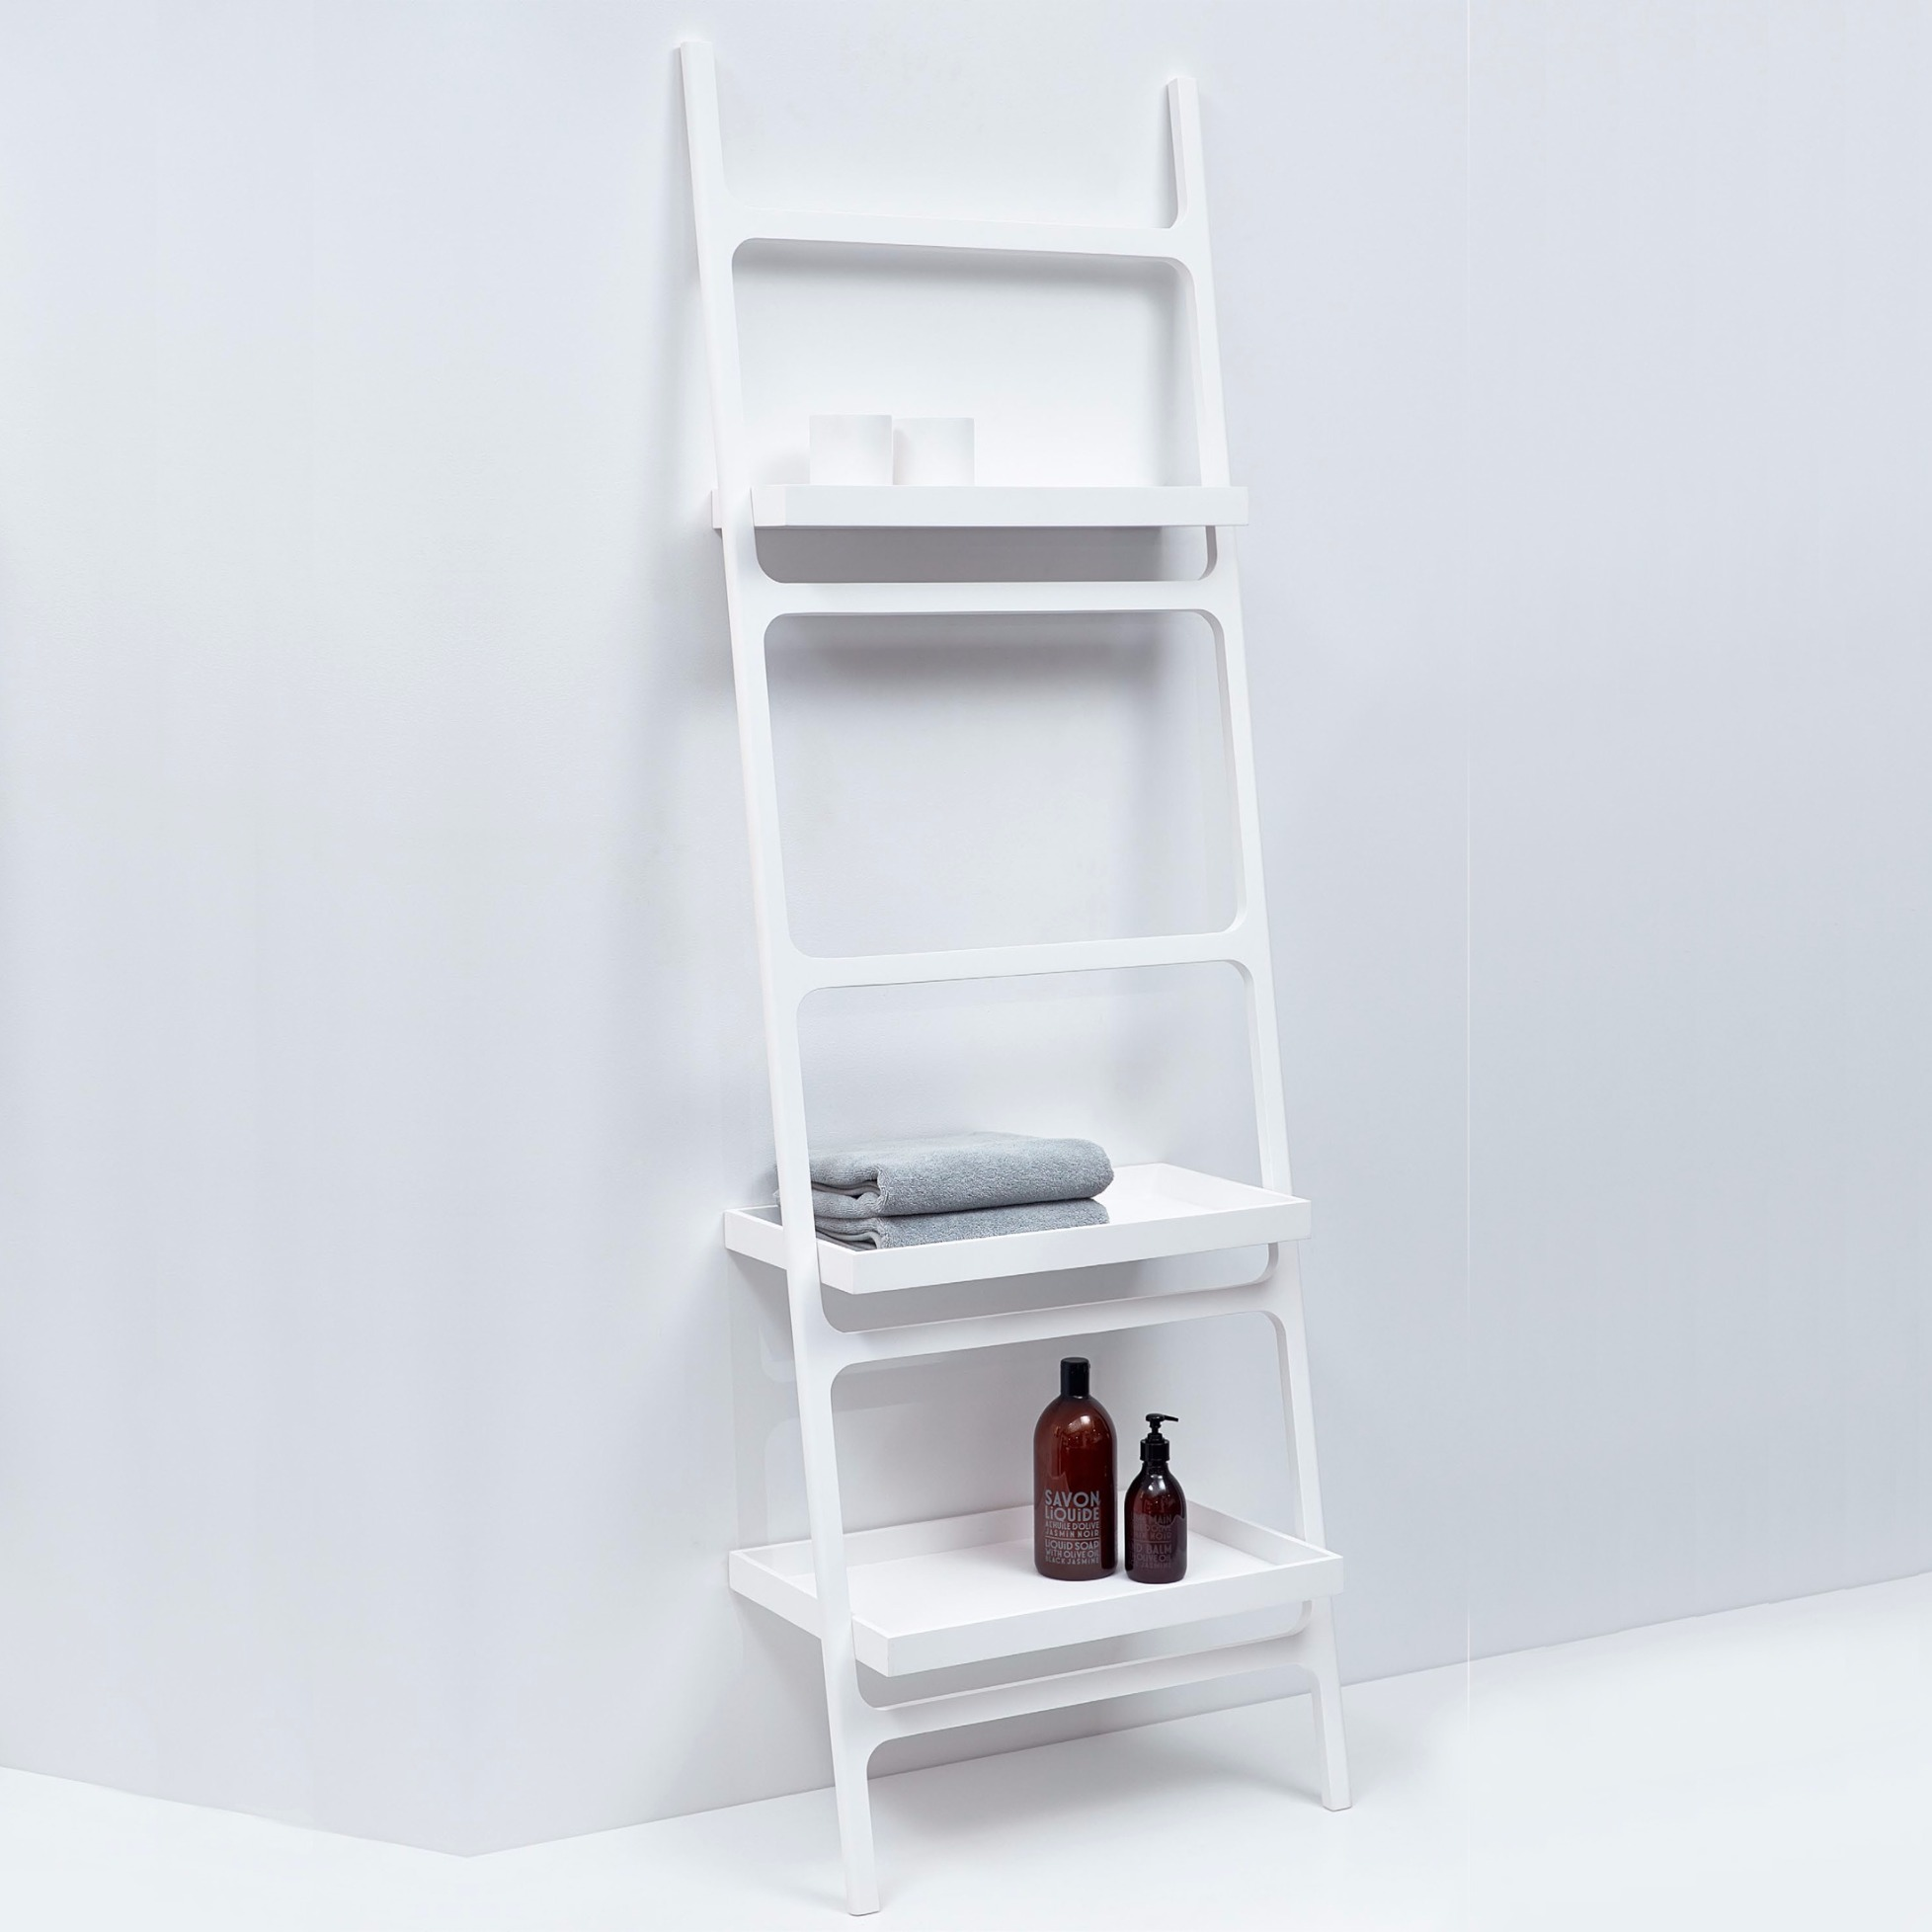 towel ladder stone htla by decor walther. Black Bedroom Furniture Sets. Home Design Ideas